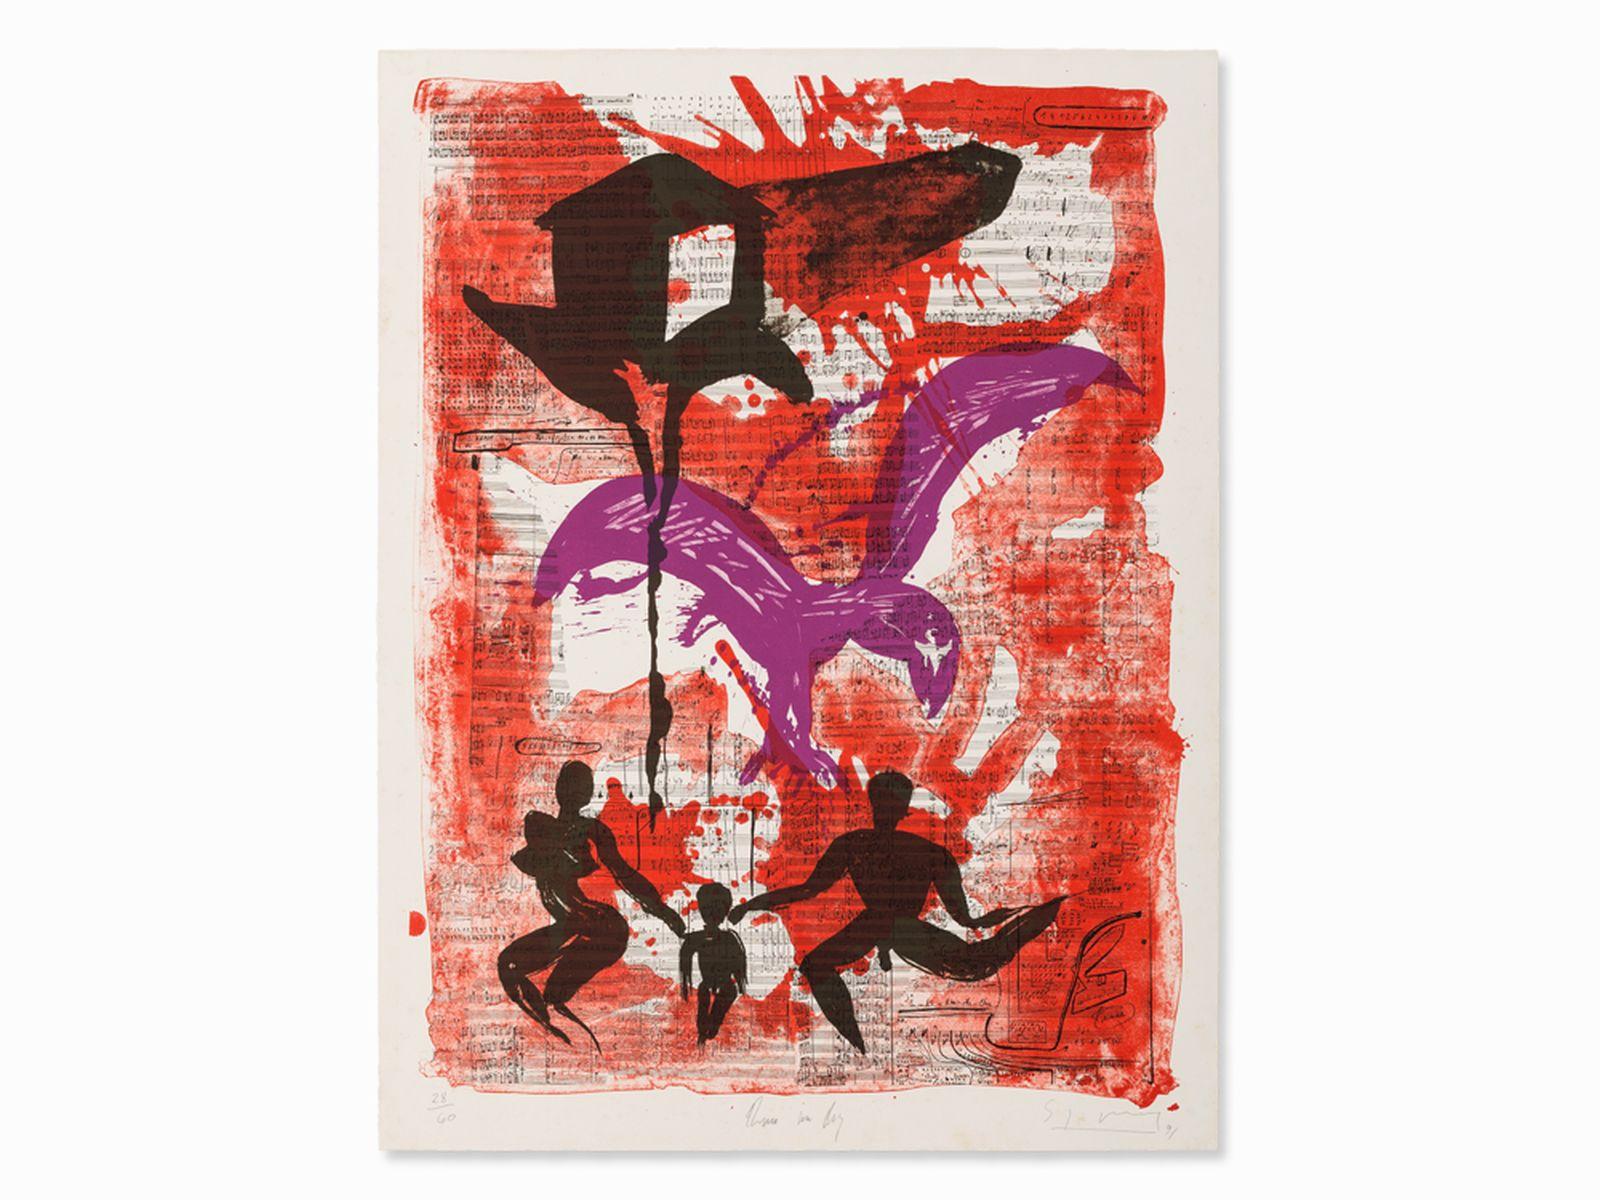 "#138 Stefan Szczesny, Lithograph, 'Dark House', Germany, 1991 | Stefan Szczesny (geb. 1951) , Lithografie, ""Dunkles Haus"", Deutschland, 1991 Image"